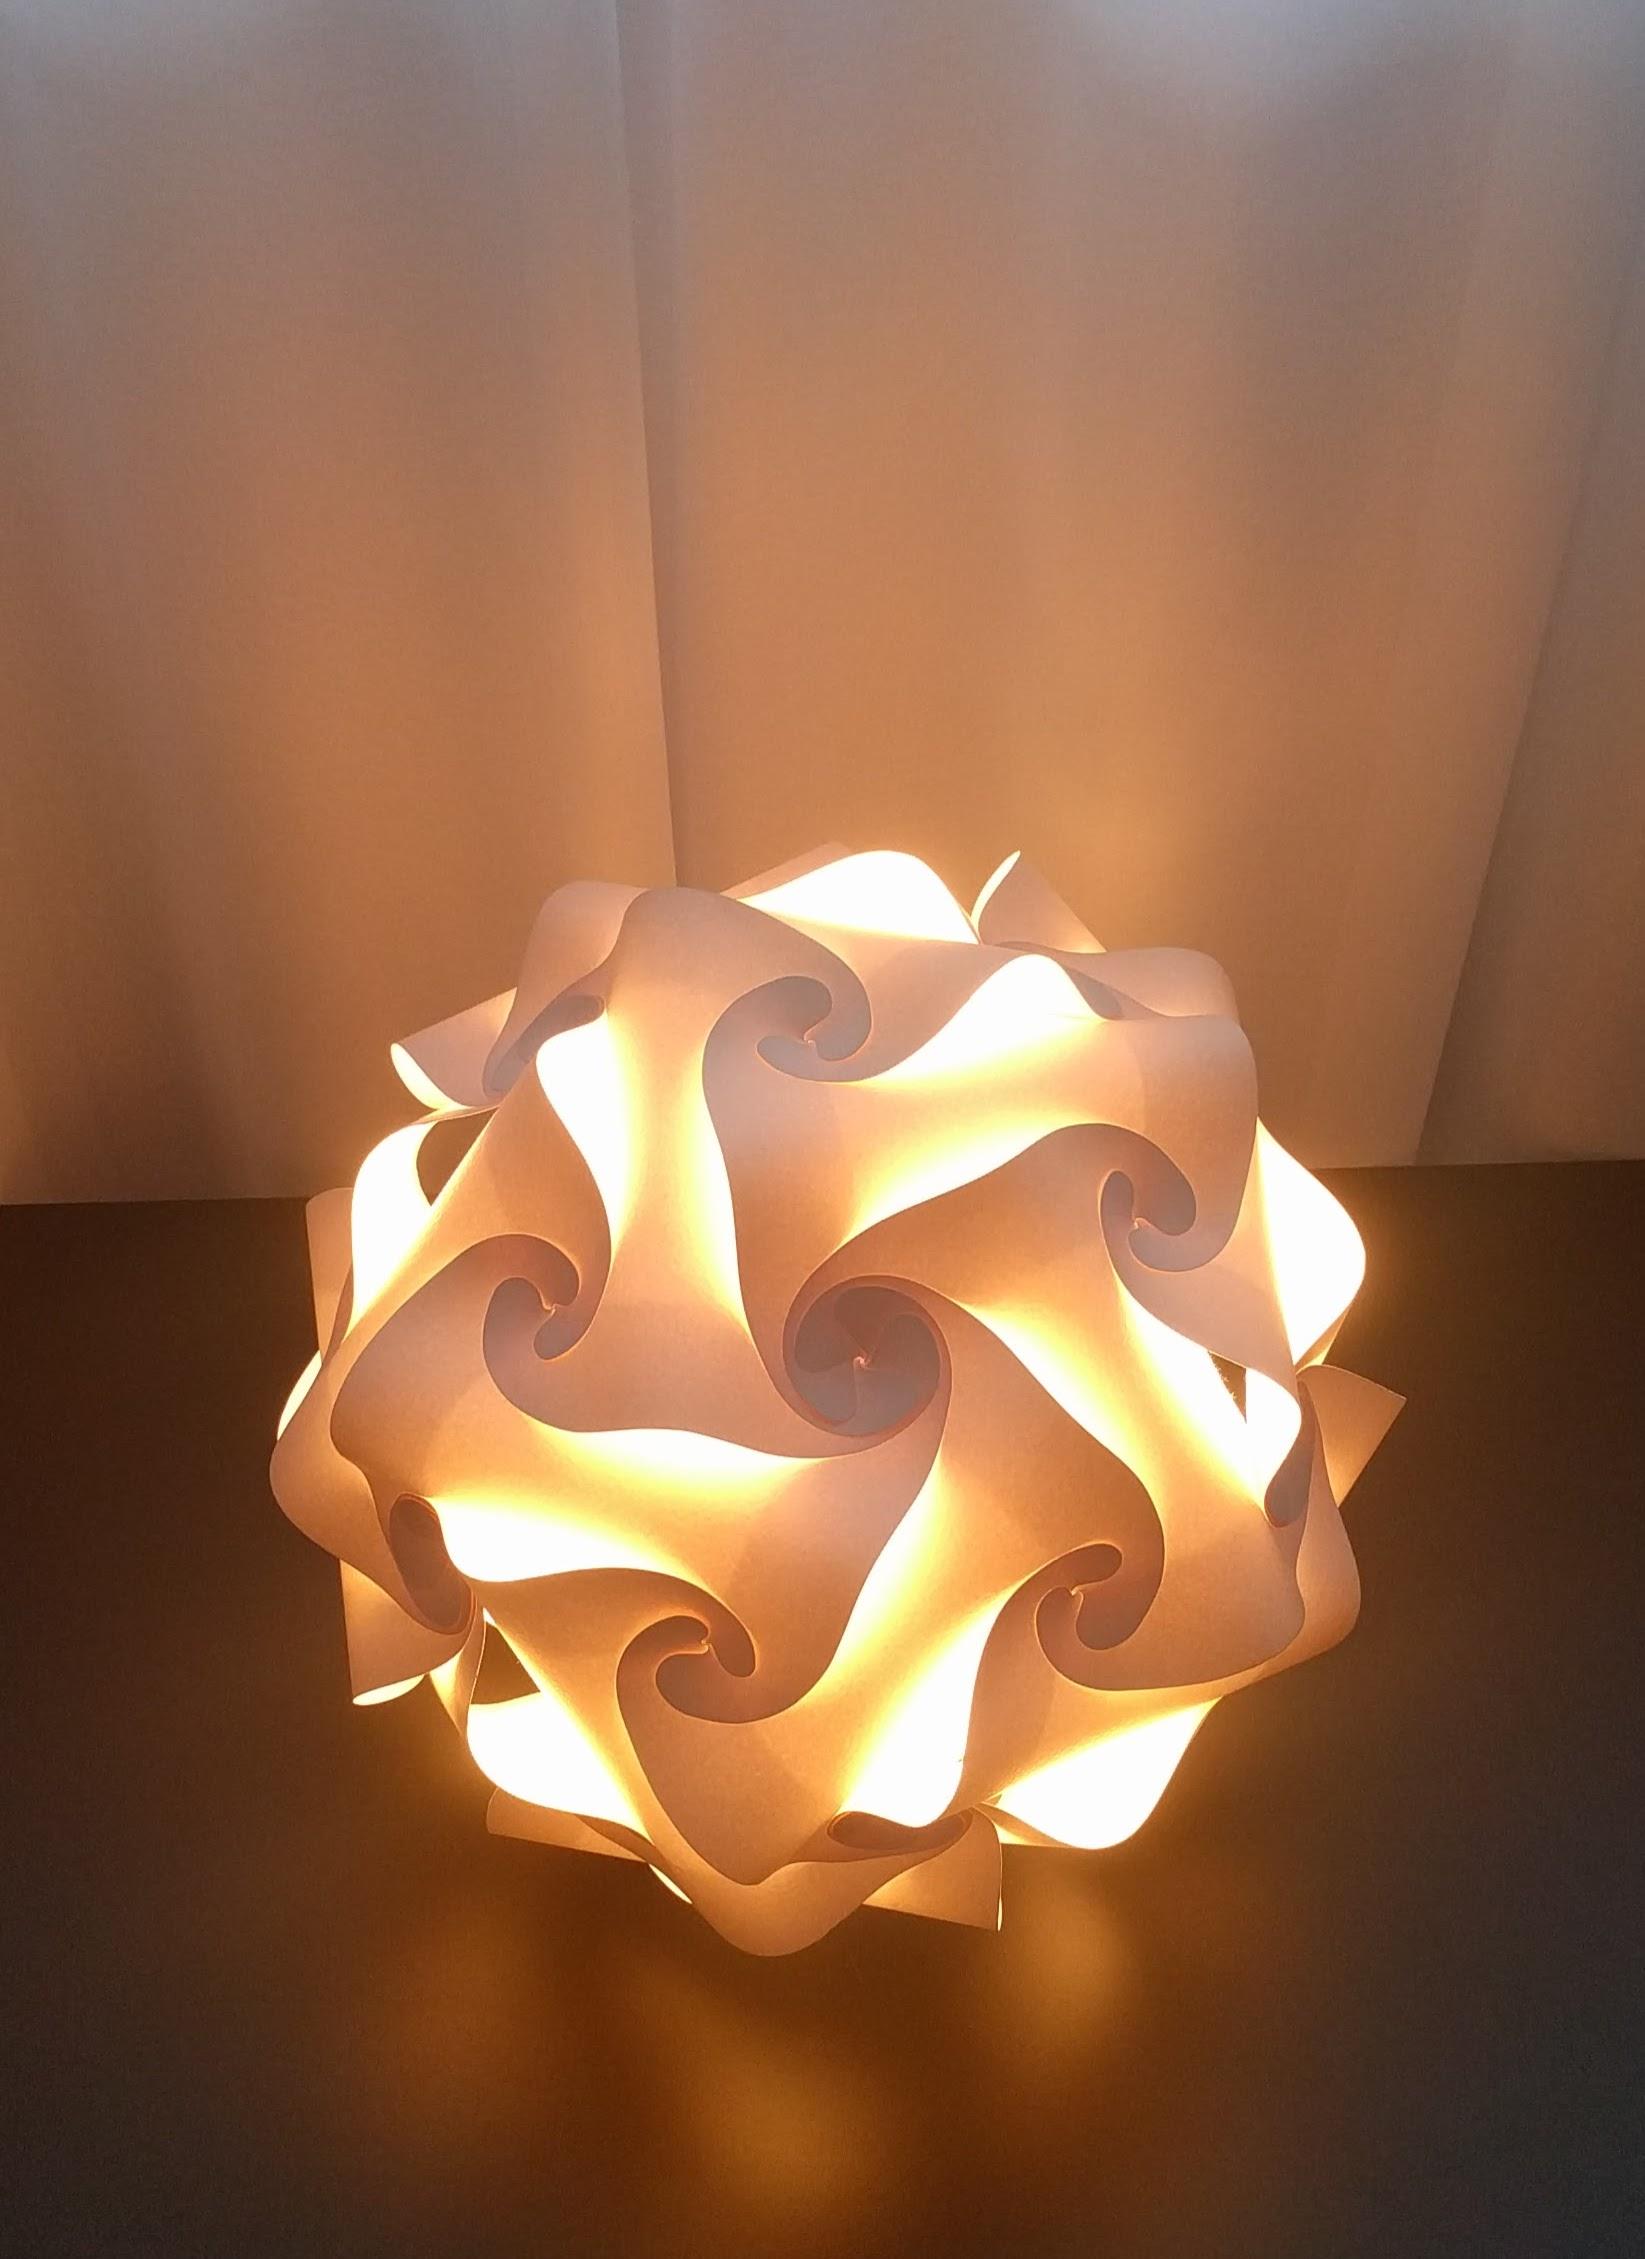 lampenb rse papier lampe aus lampenmanufaktur oberkirch. Black Bedroom Furniture Sets. Home Design Ideas